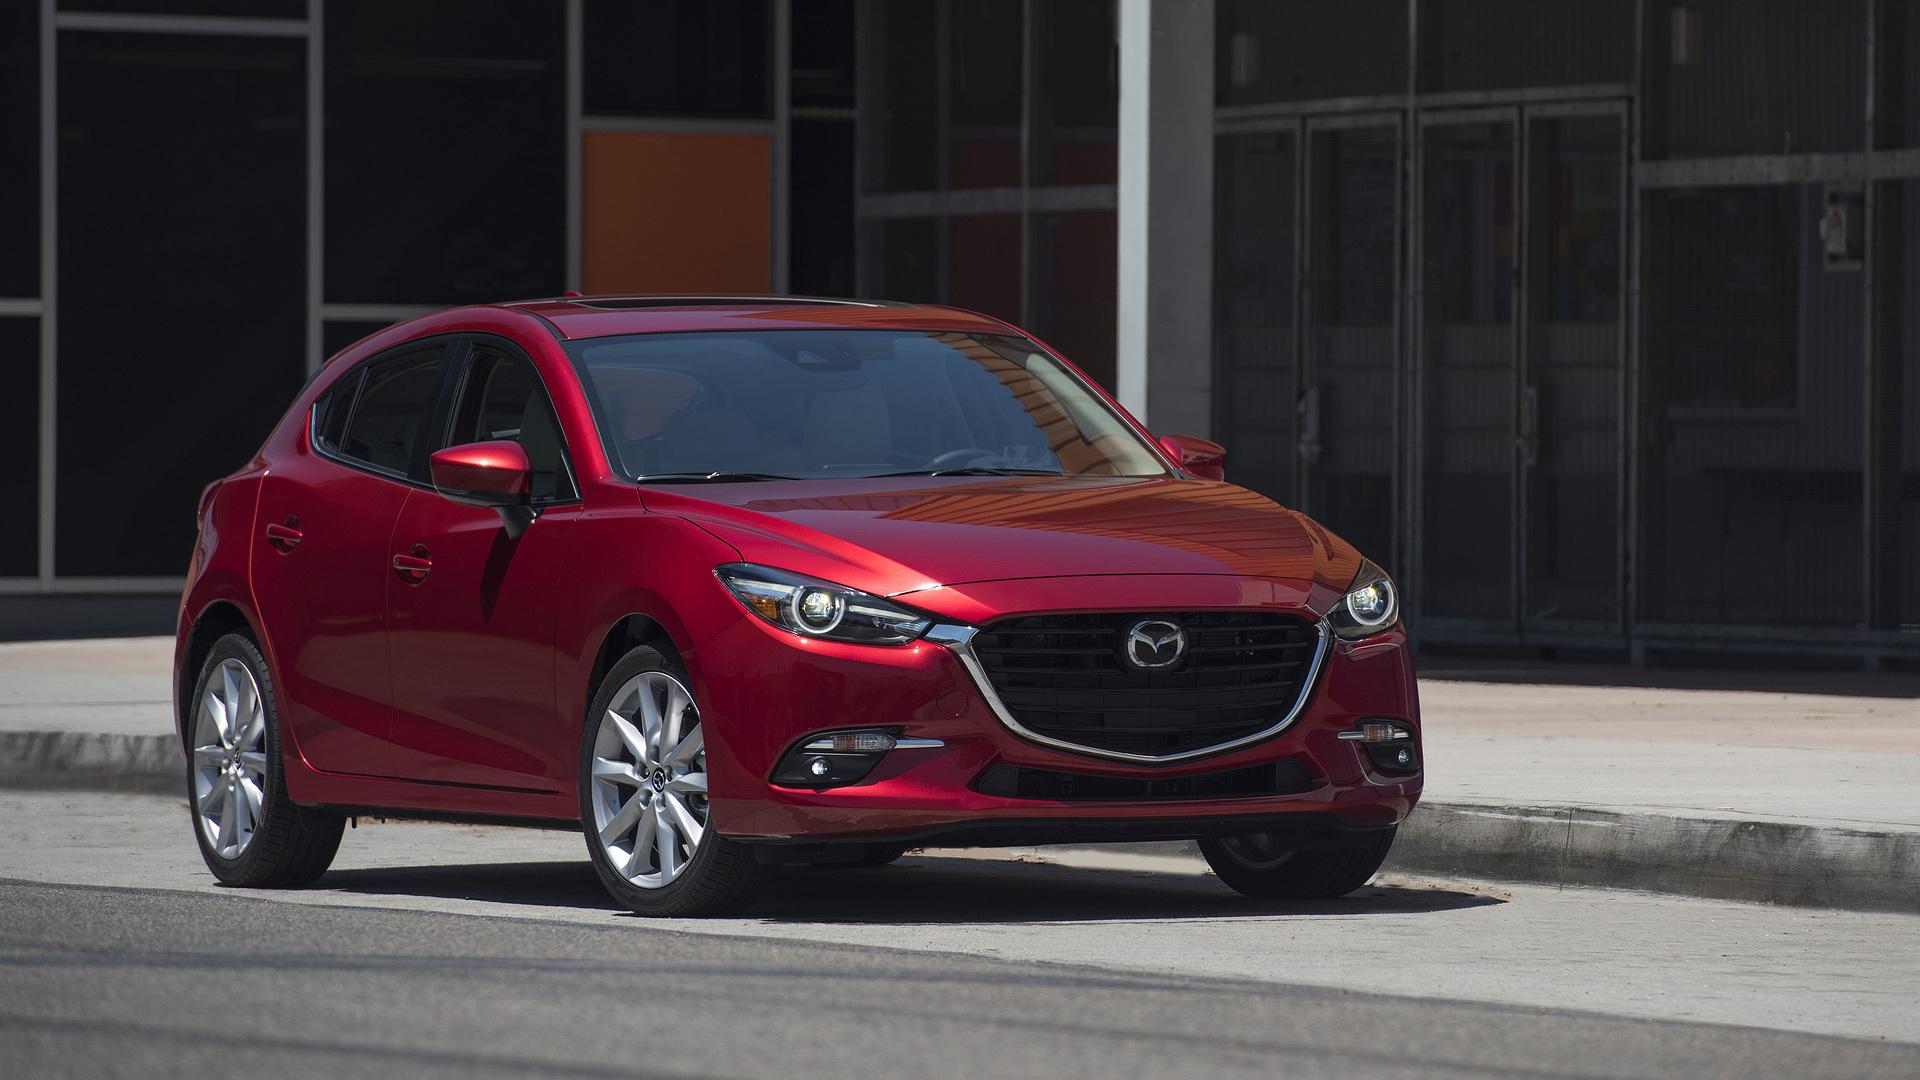 2017 Mazda3 Mazda6 restyled gain more technology